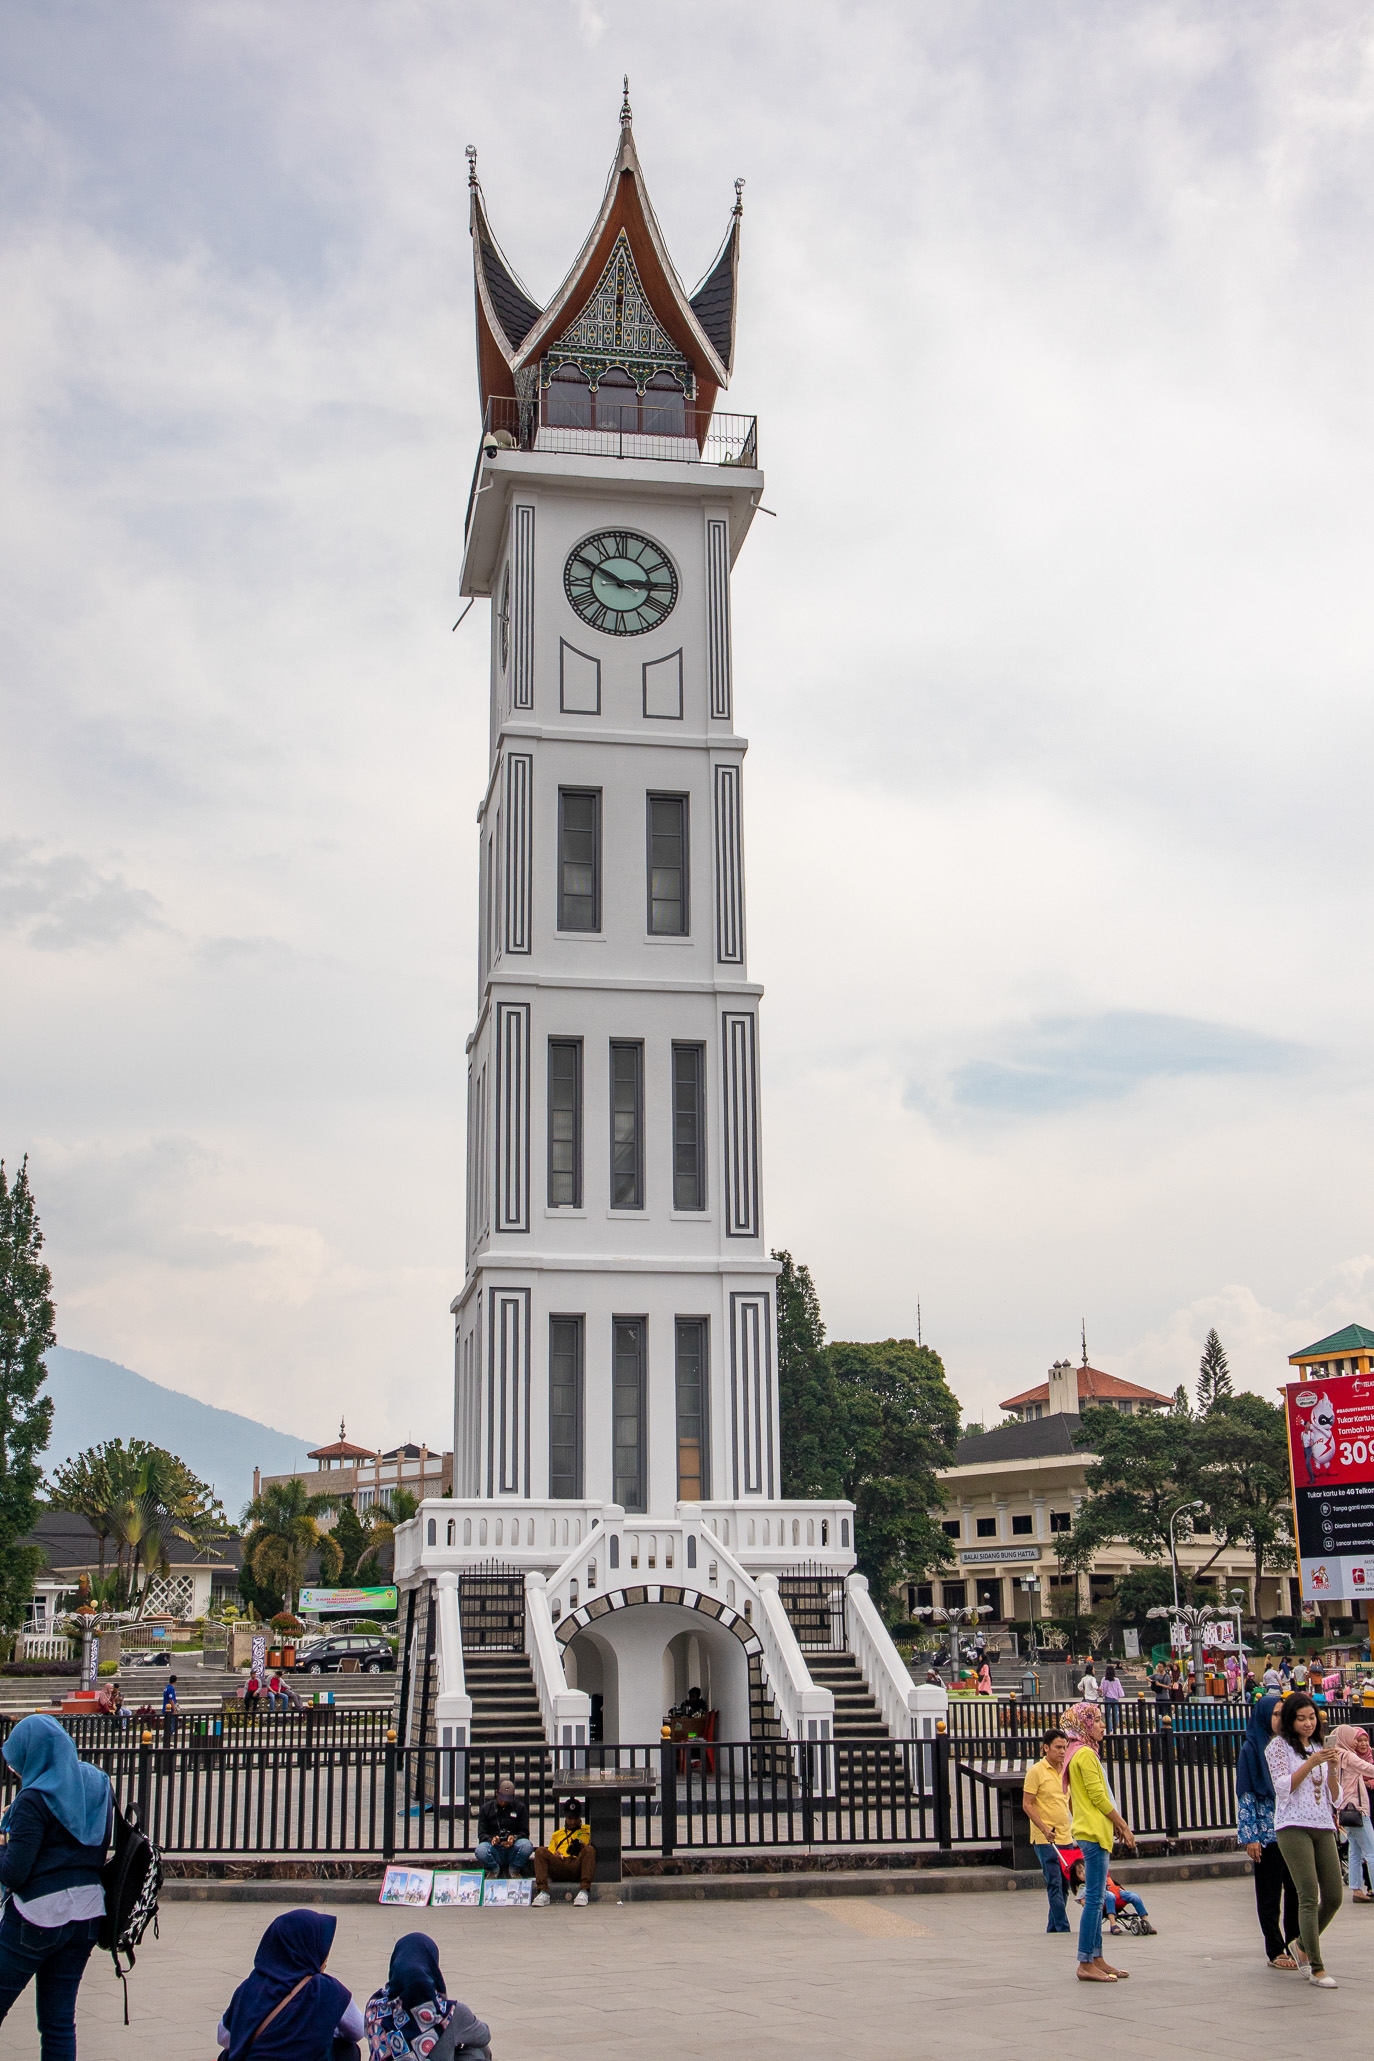 https://bubo.sk/uploads/galleries/7396/tomashornak_indonezia_sumatra_img_0266-1-2.jpg